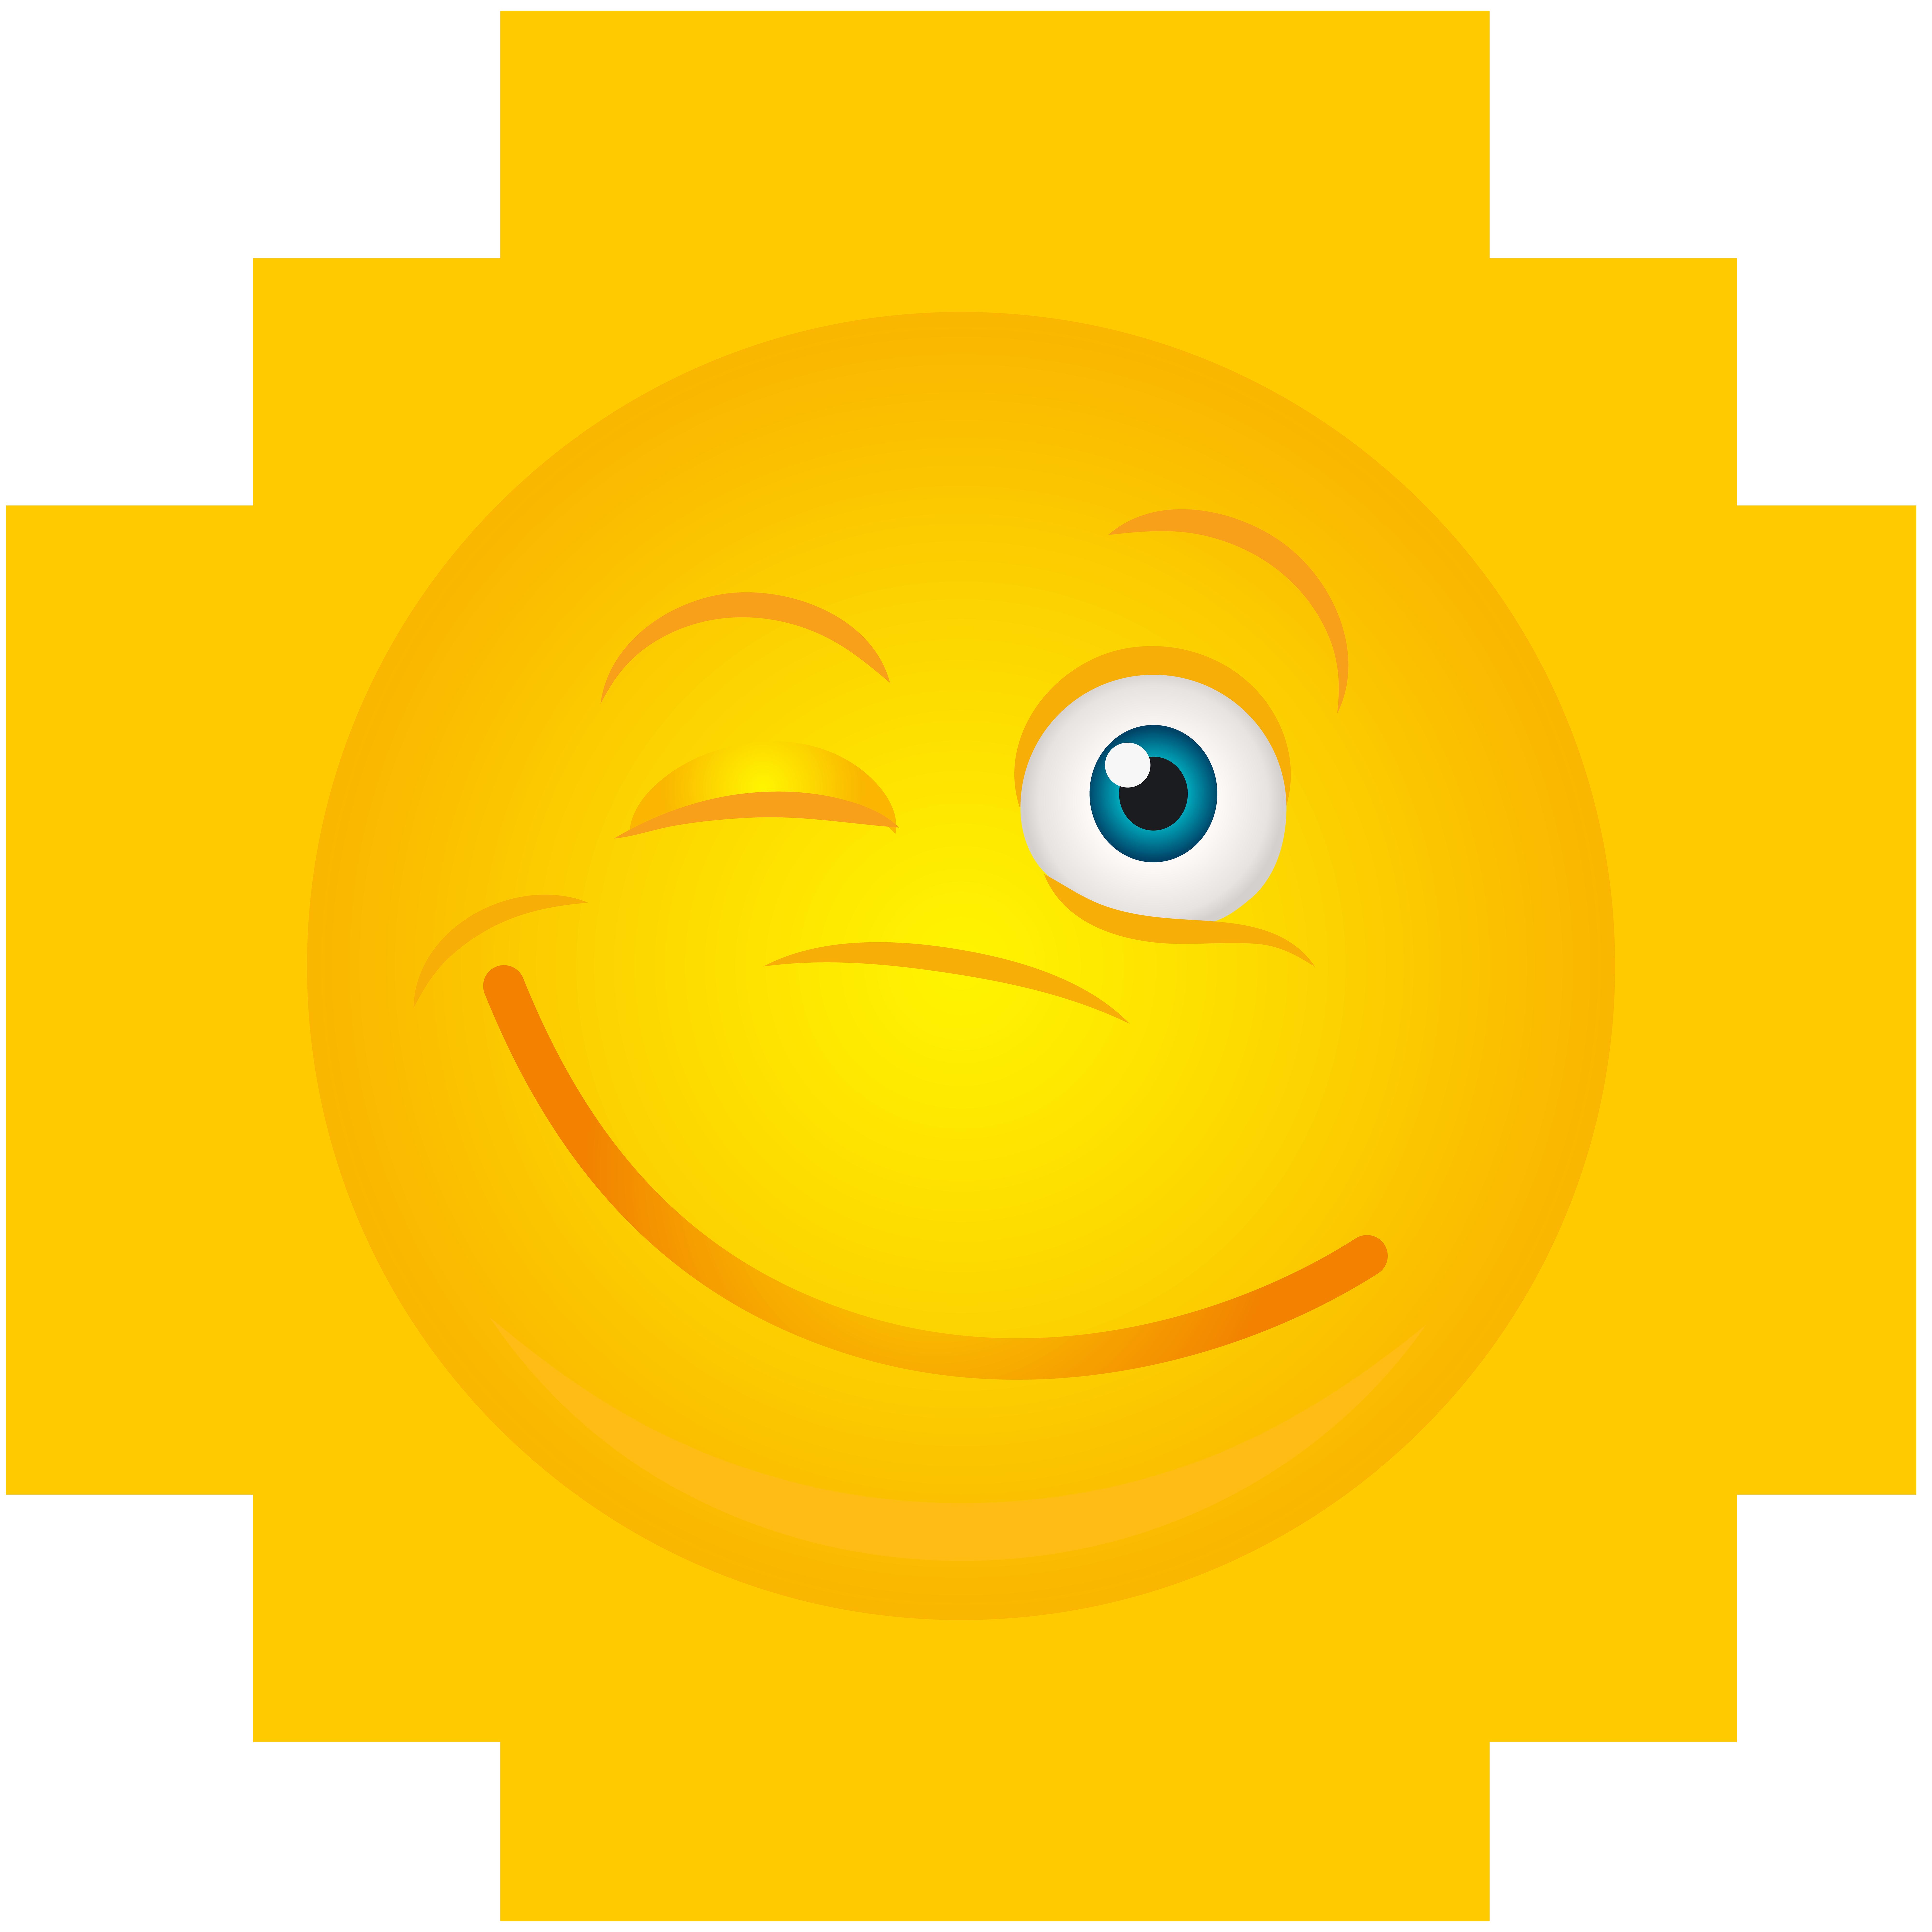 Winking Sun Transparent Clip Art Image   Gallery Yopriceville ... image transparent stock